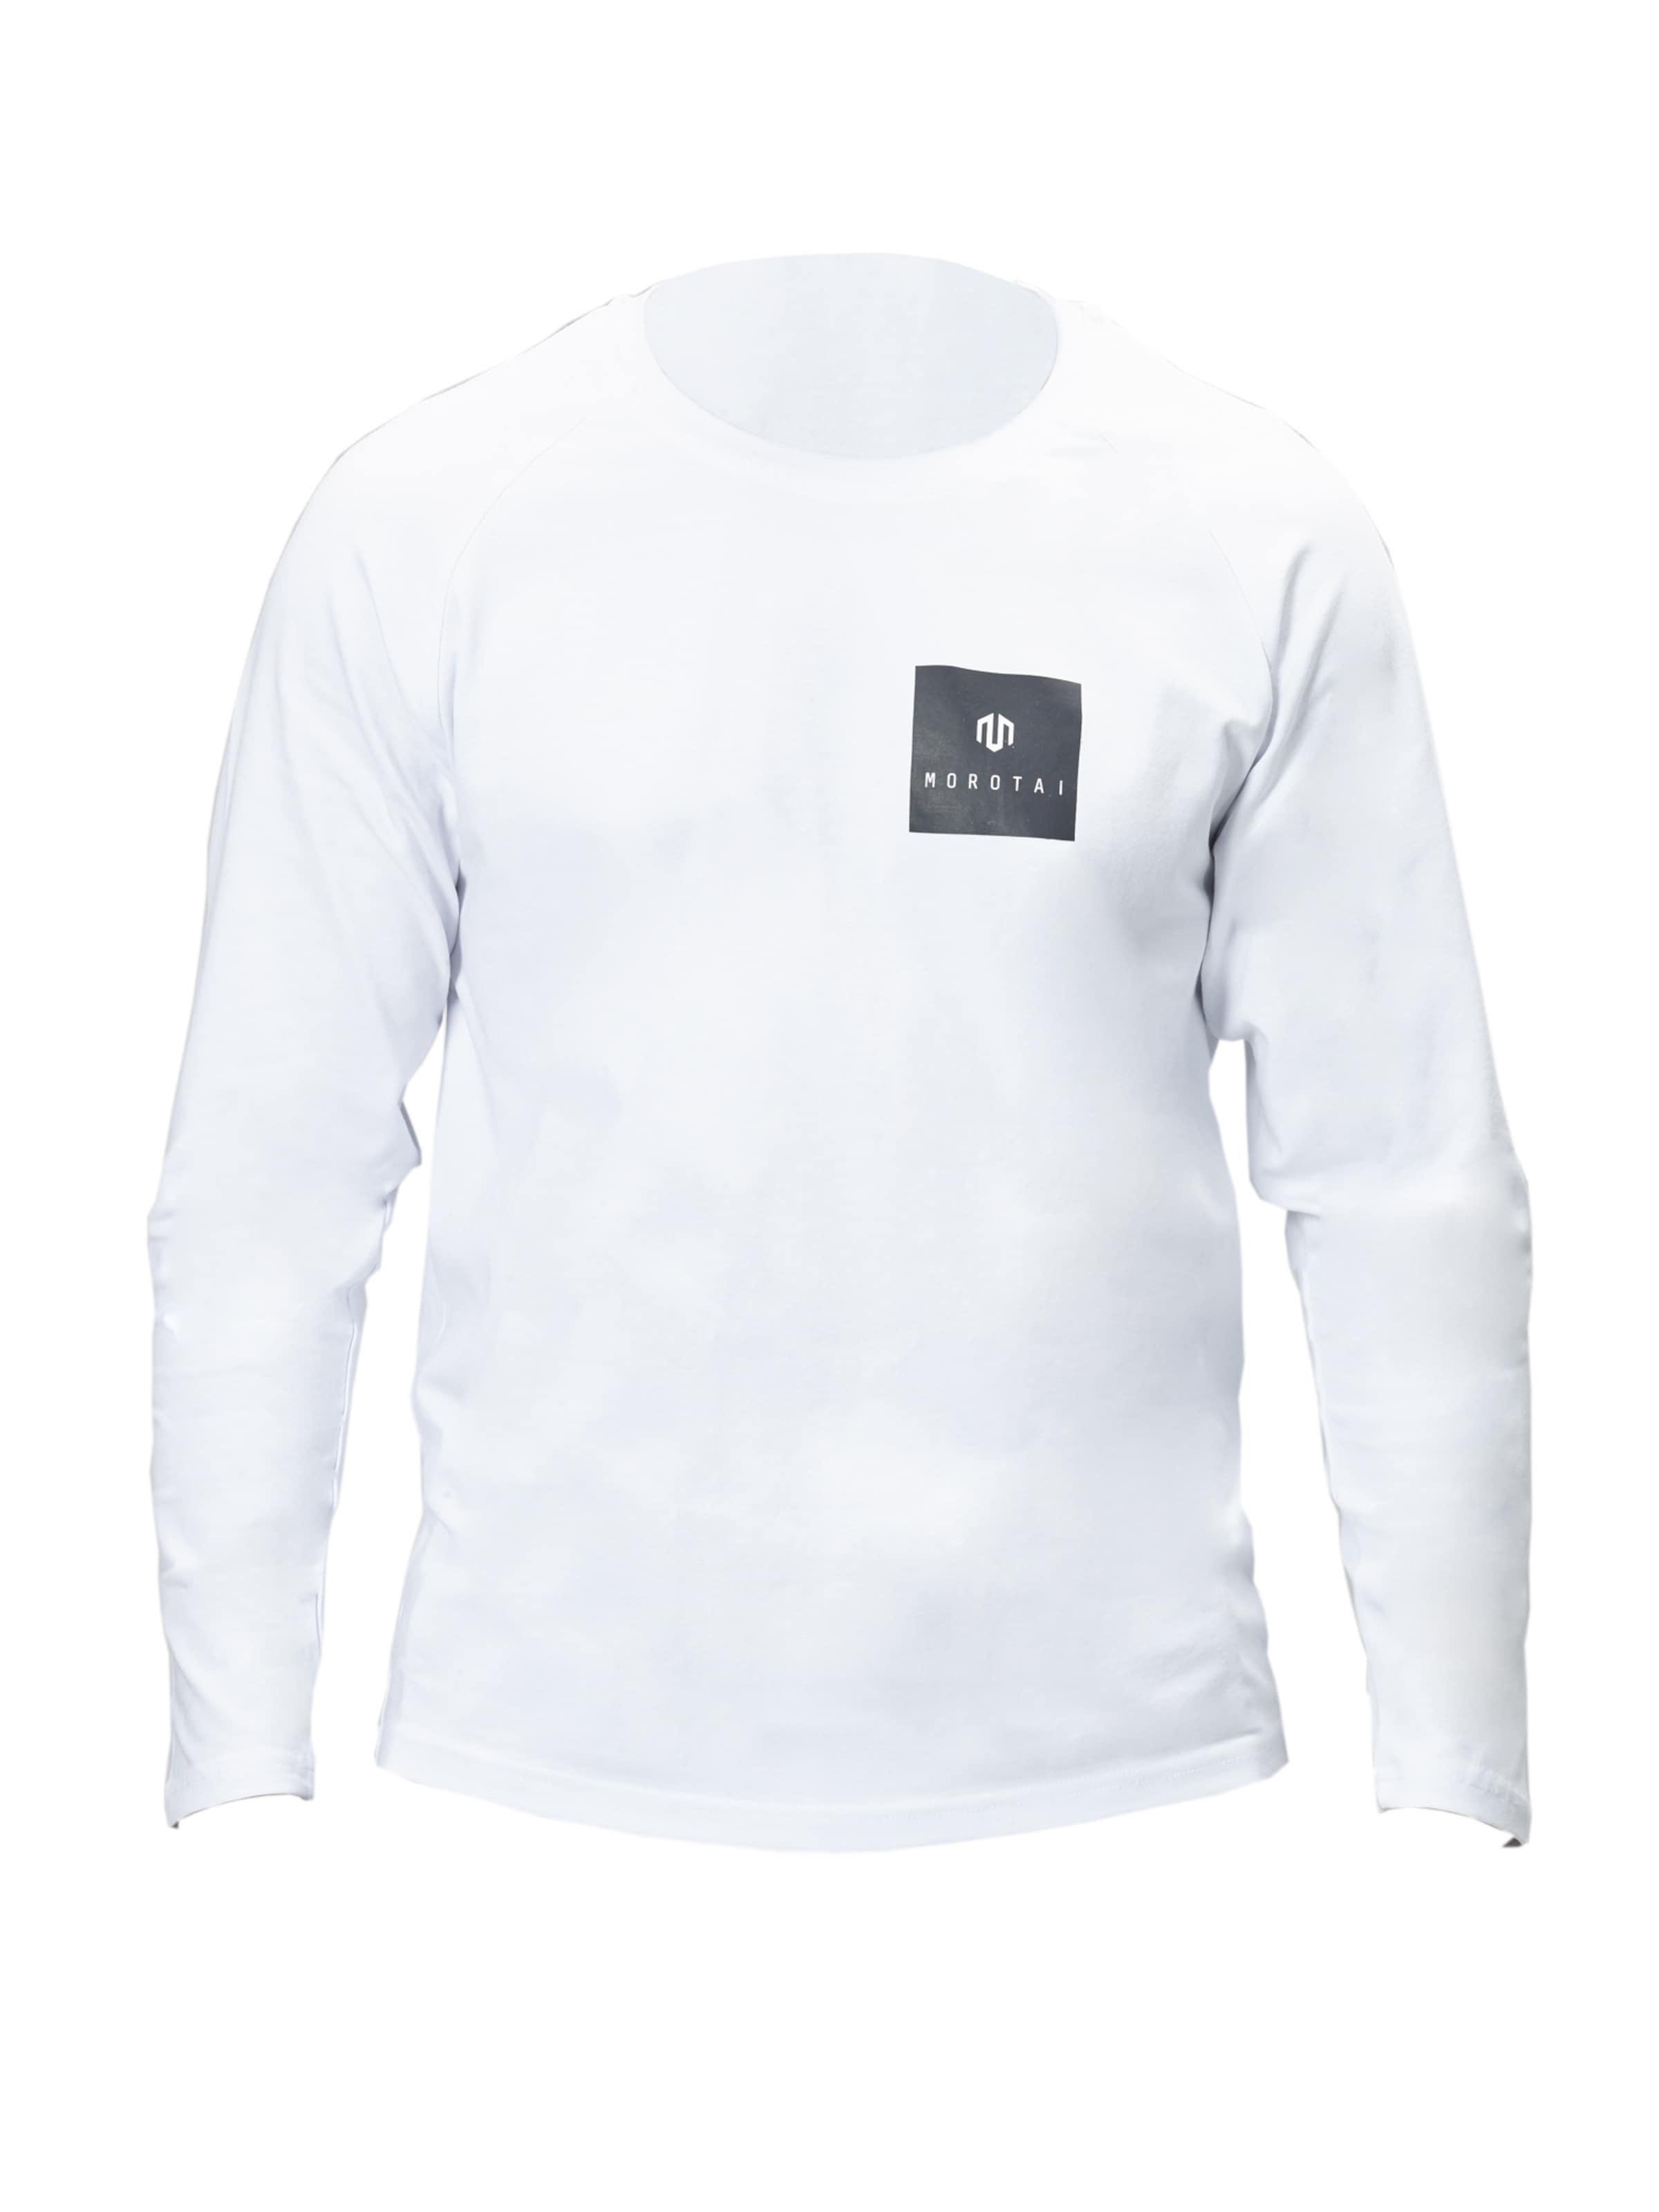 Herren MOROTAI Shirt blau,  rot, schwarz,  weiß | 04251556203124